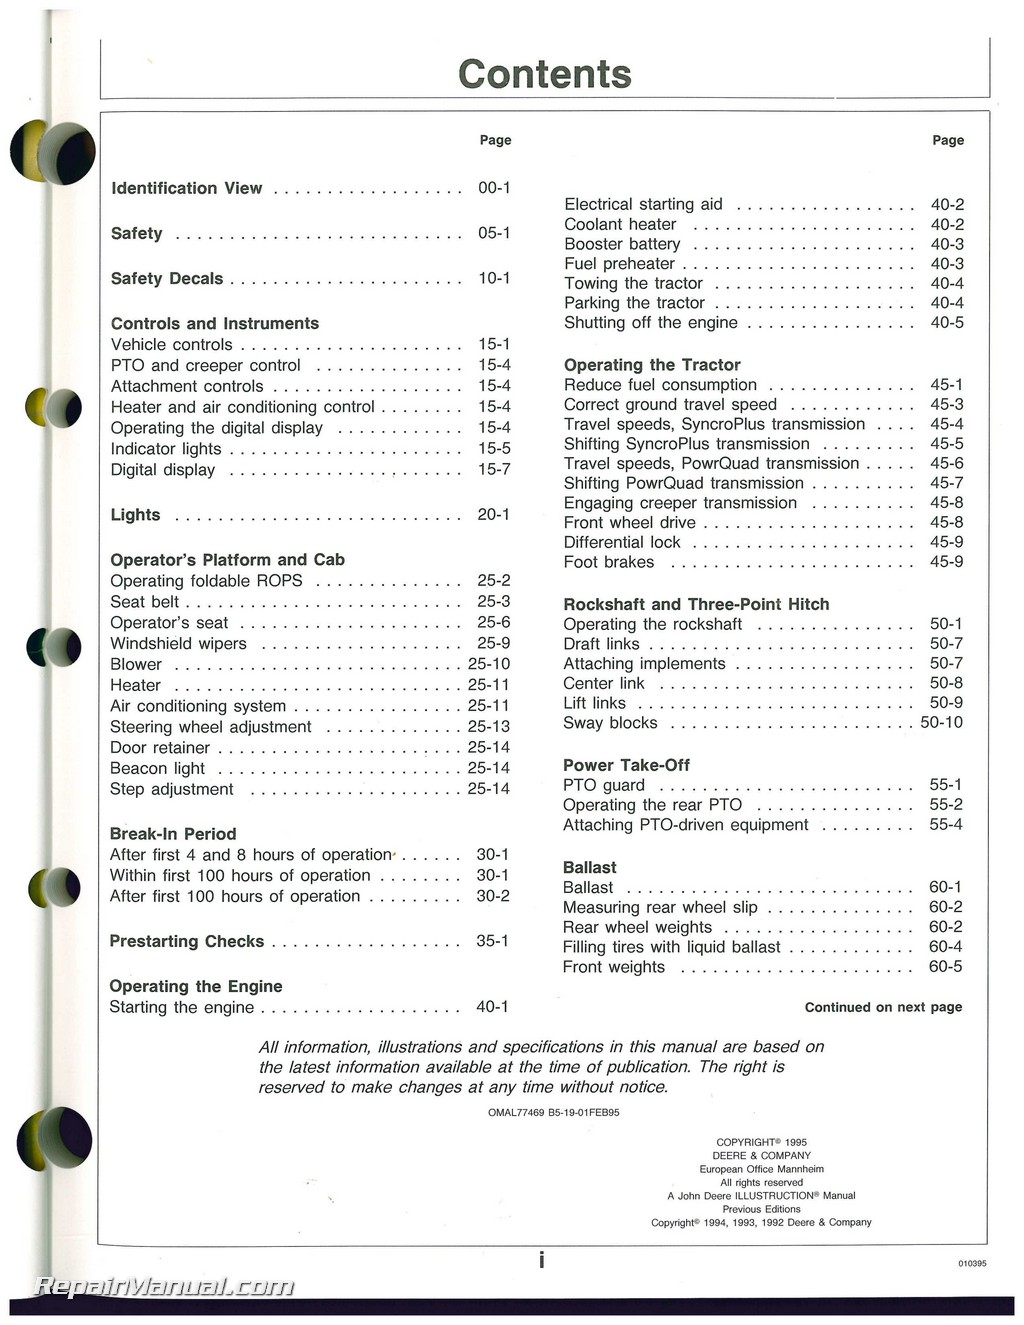 used john deere 6200 6200l 6300 6300l 6400 6400l and 6500l rh repairmanual com john deere 5300 repair manual download john deere 6300 tractor service manual